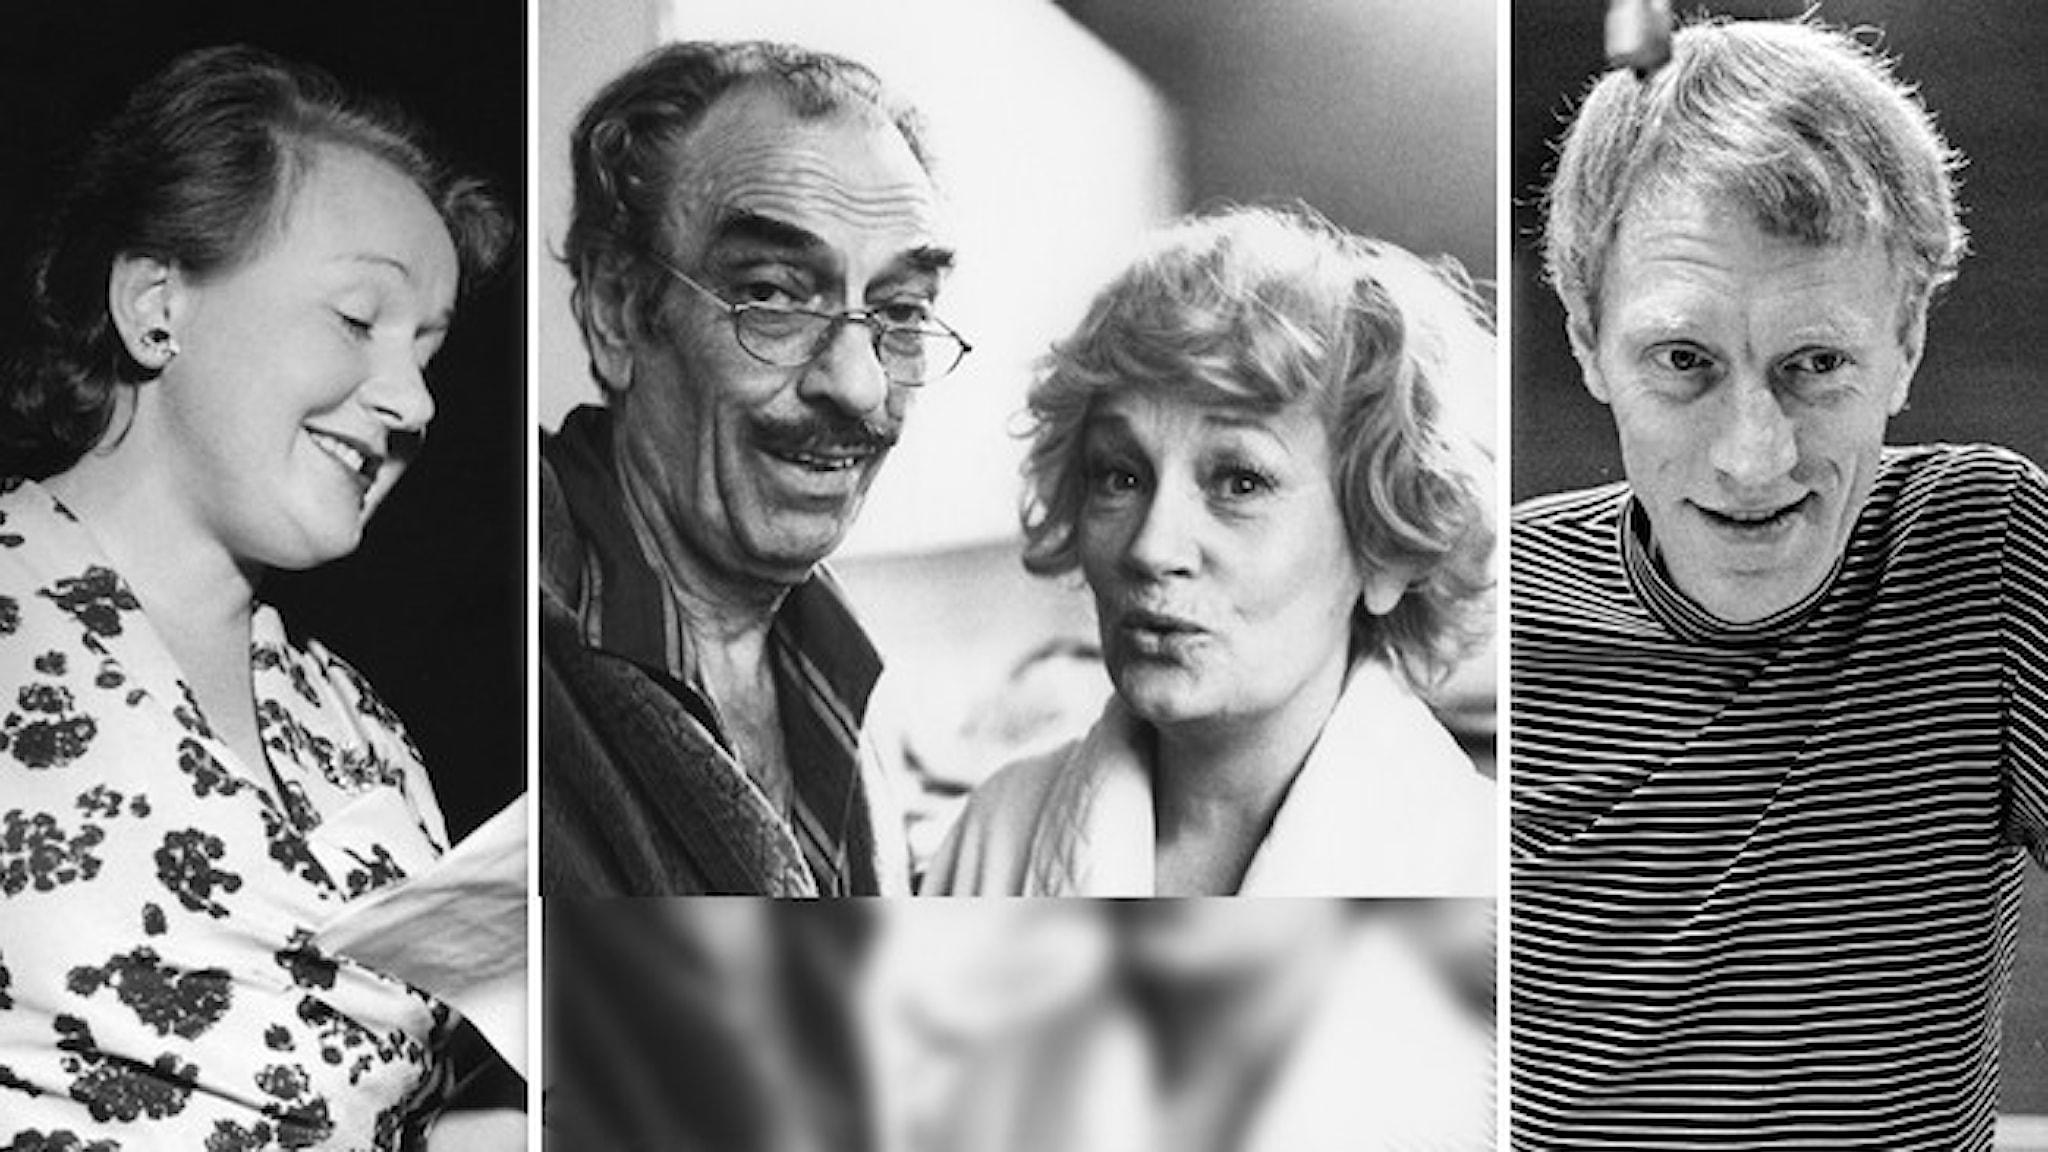 Kvartetten Sif Ruud, Gösta Bernhard, Siw Ericks och Max von Sydow i bildmontage.